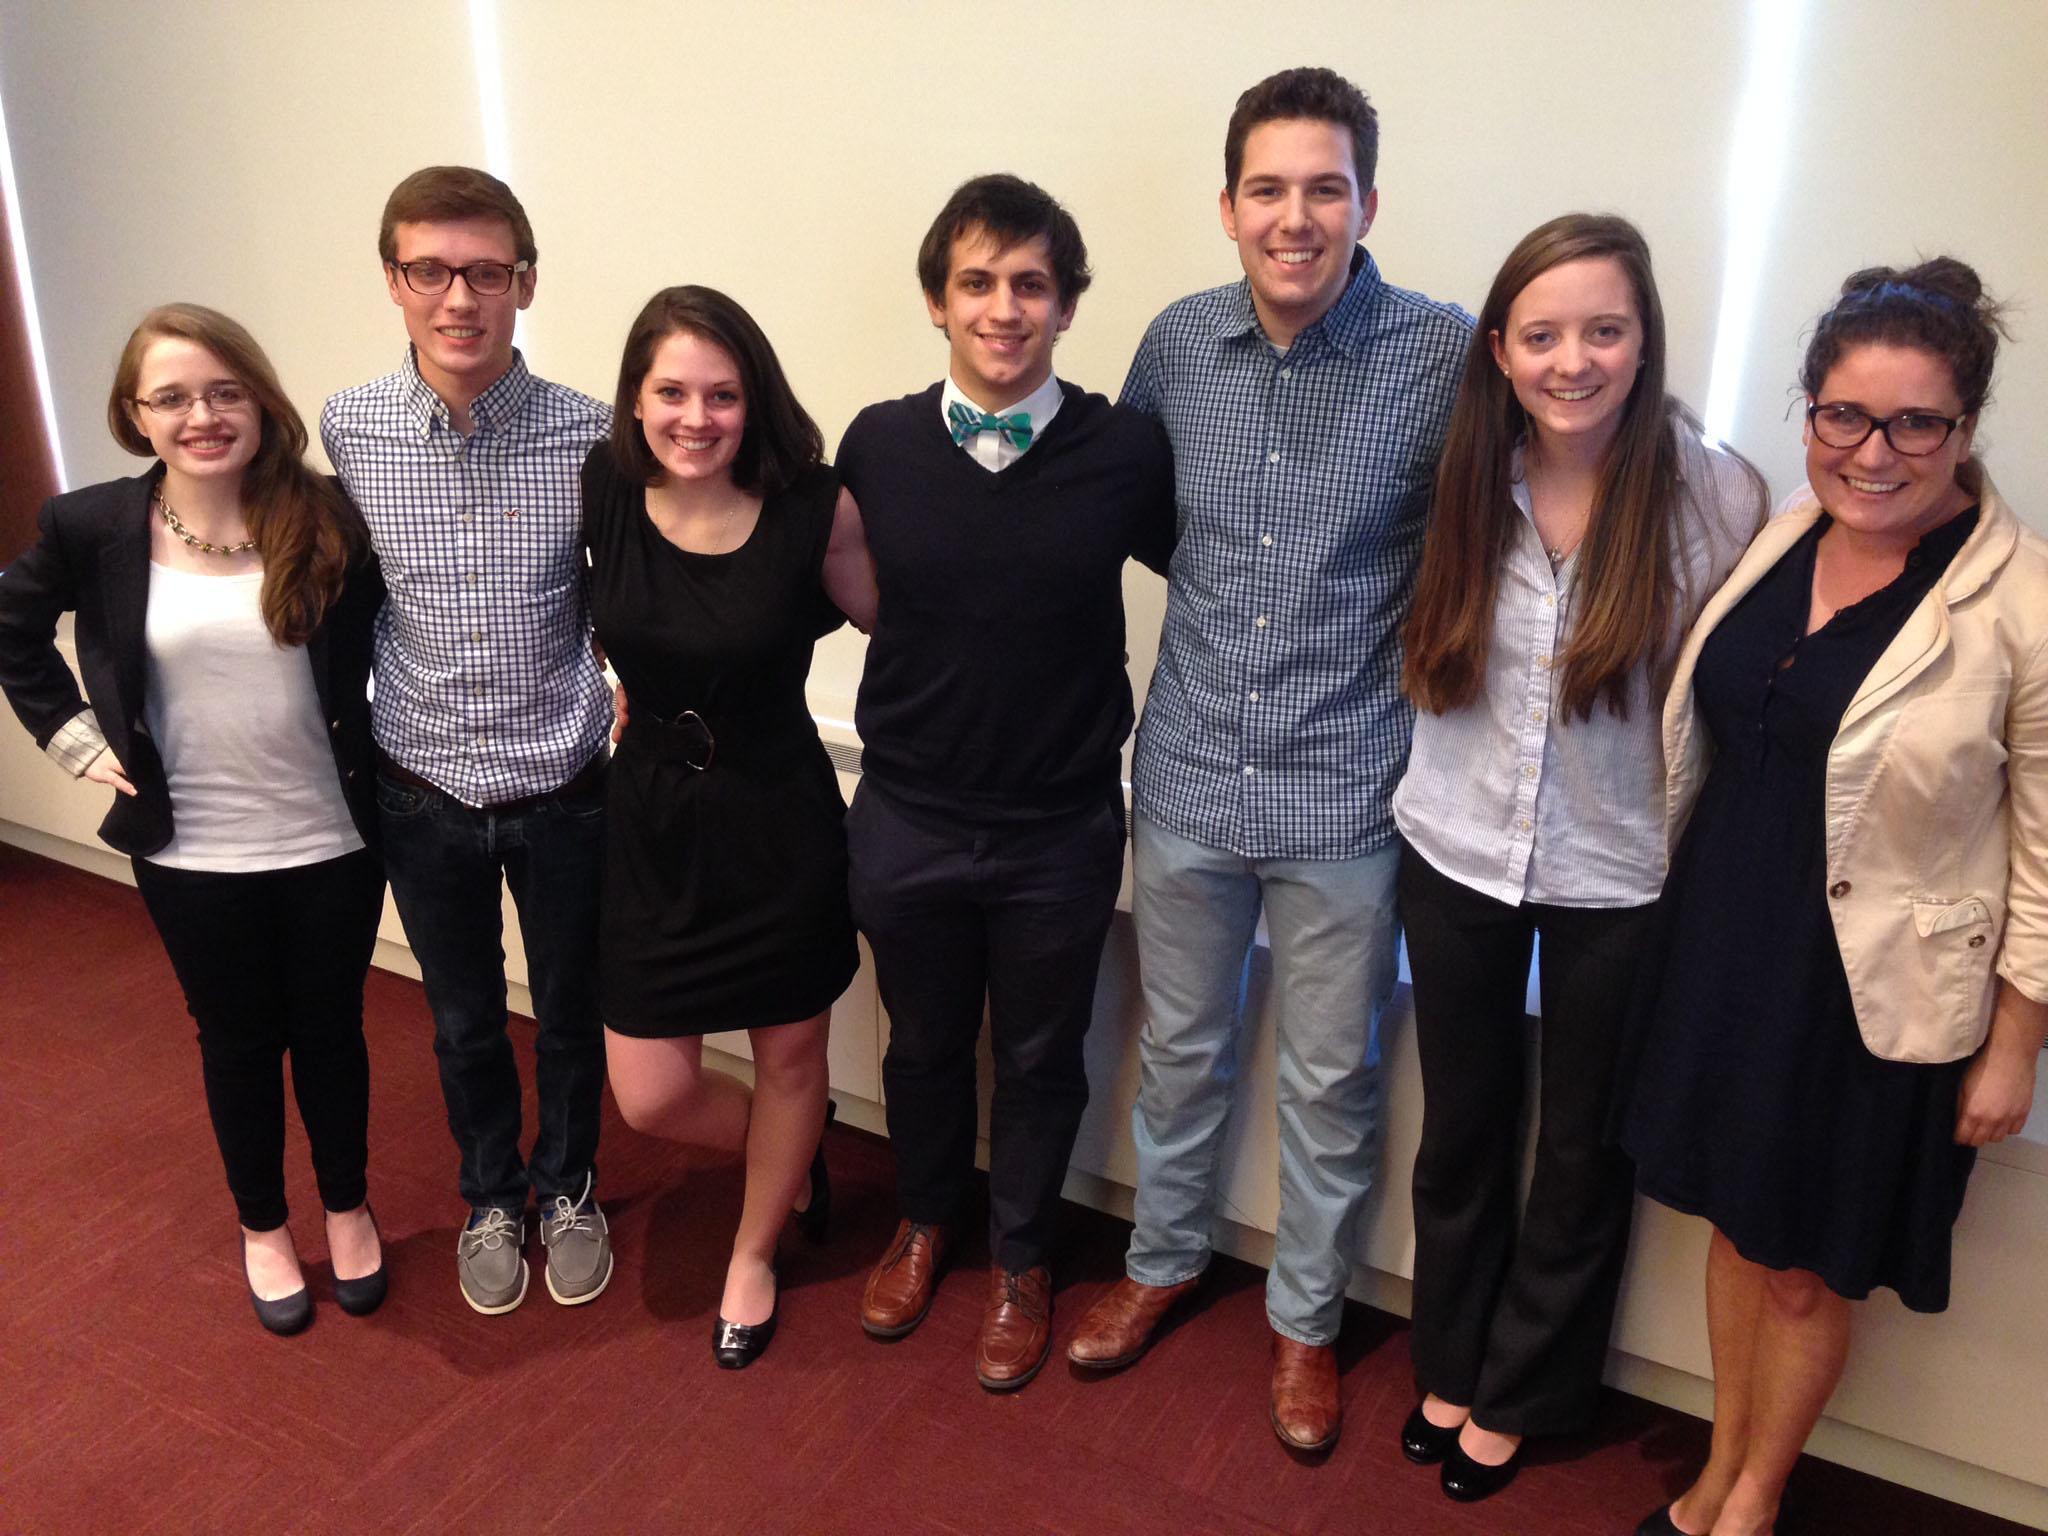 Led by junior senator Jenny Rankin, IGNITE looks to invigorate school spirit.